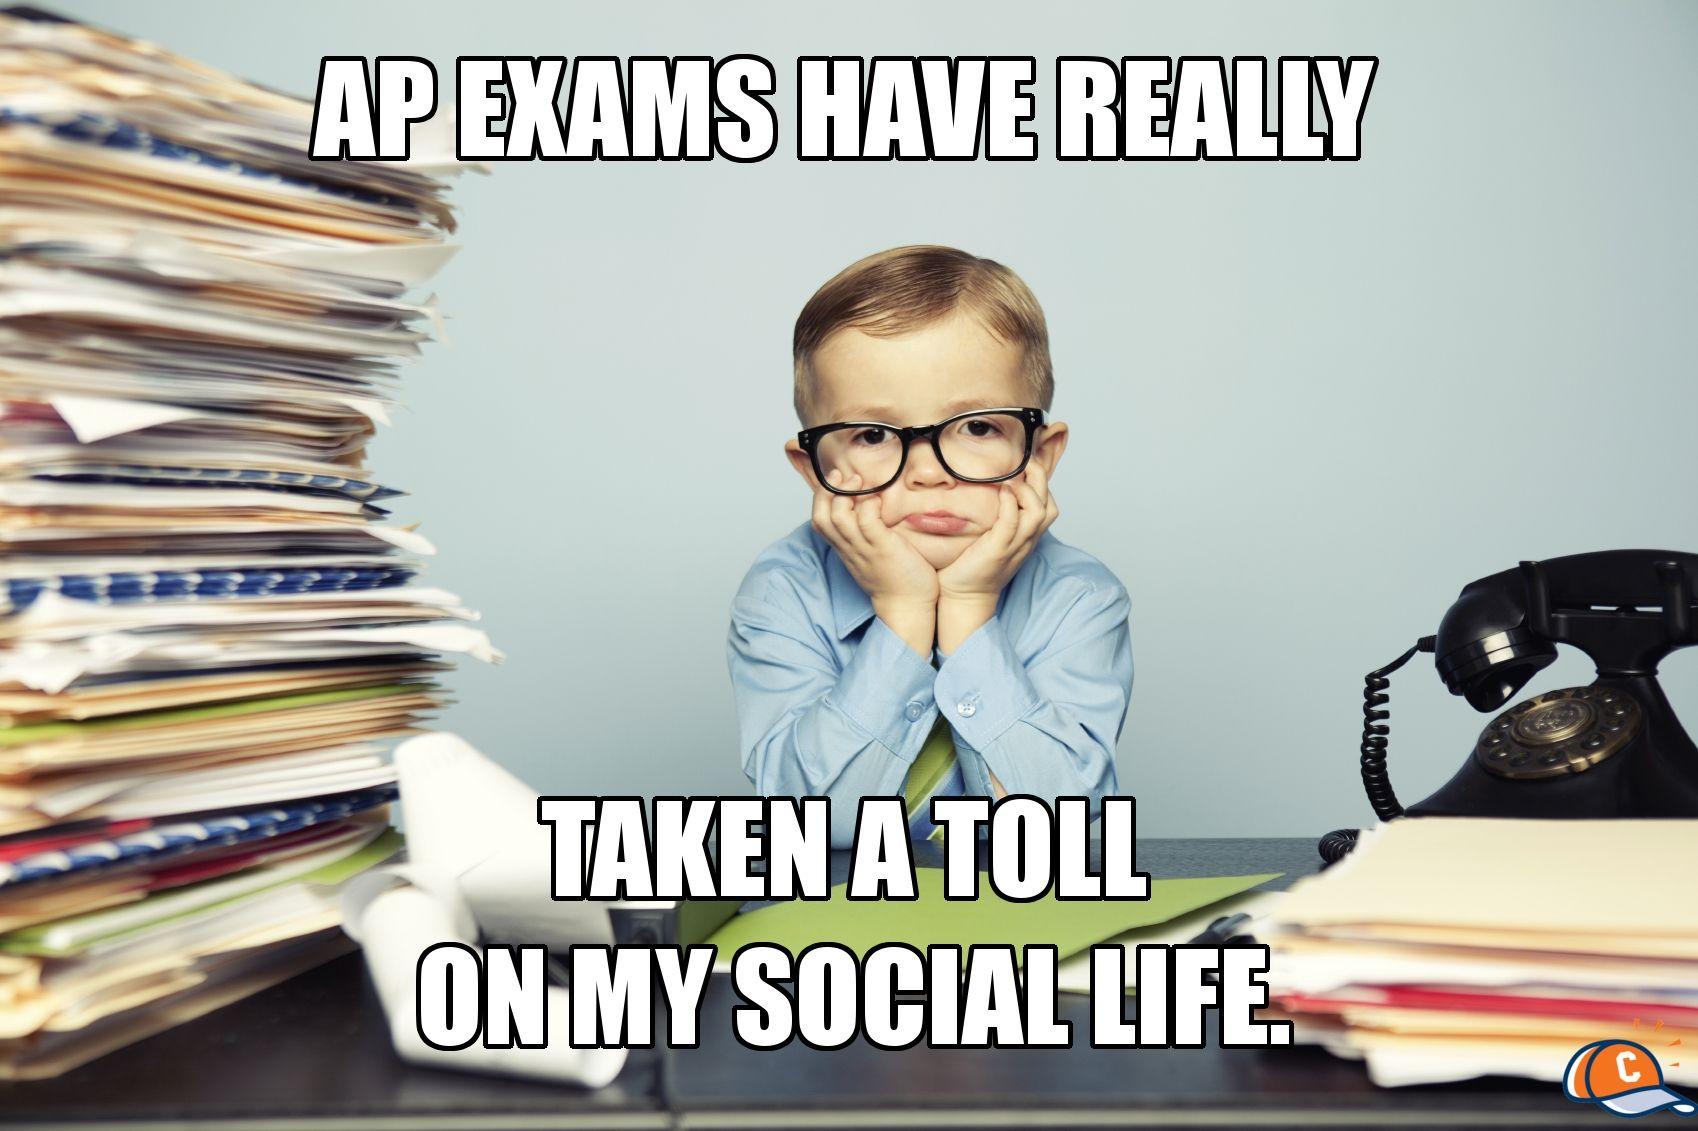 Google Image Result For Http Www Cappex Com Blog Wp Content Uploads 2012 05 Meme Ap Exams Jpg Ap Exams School Essay Ap Test